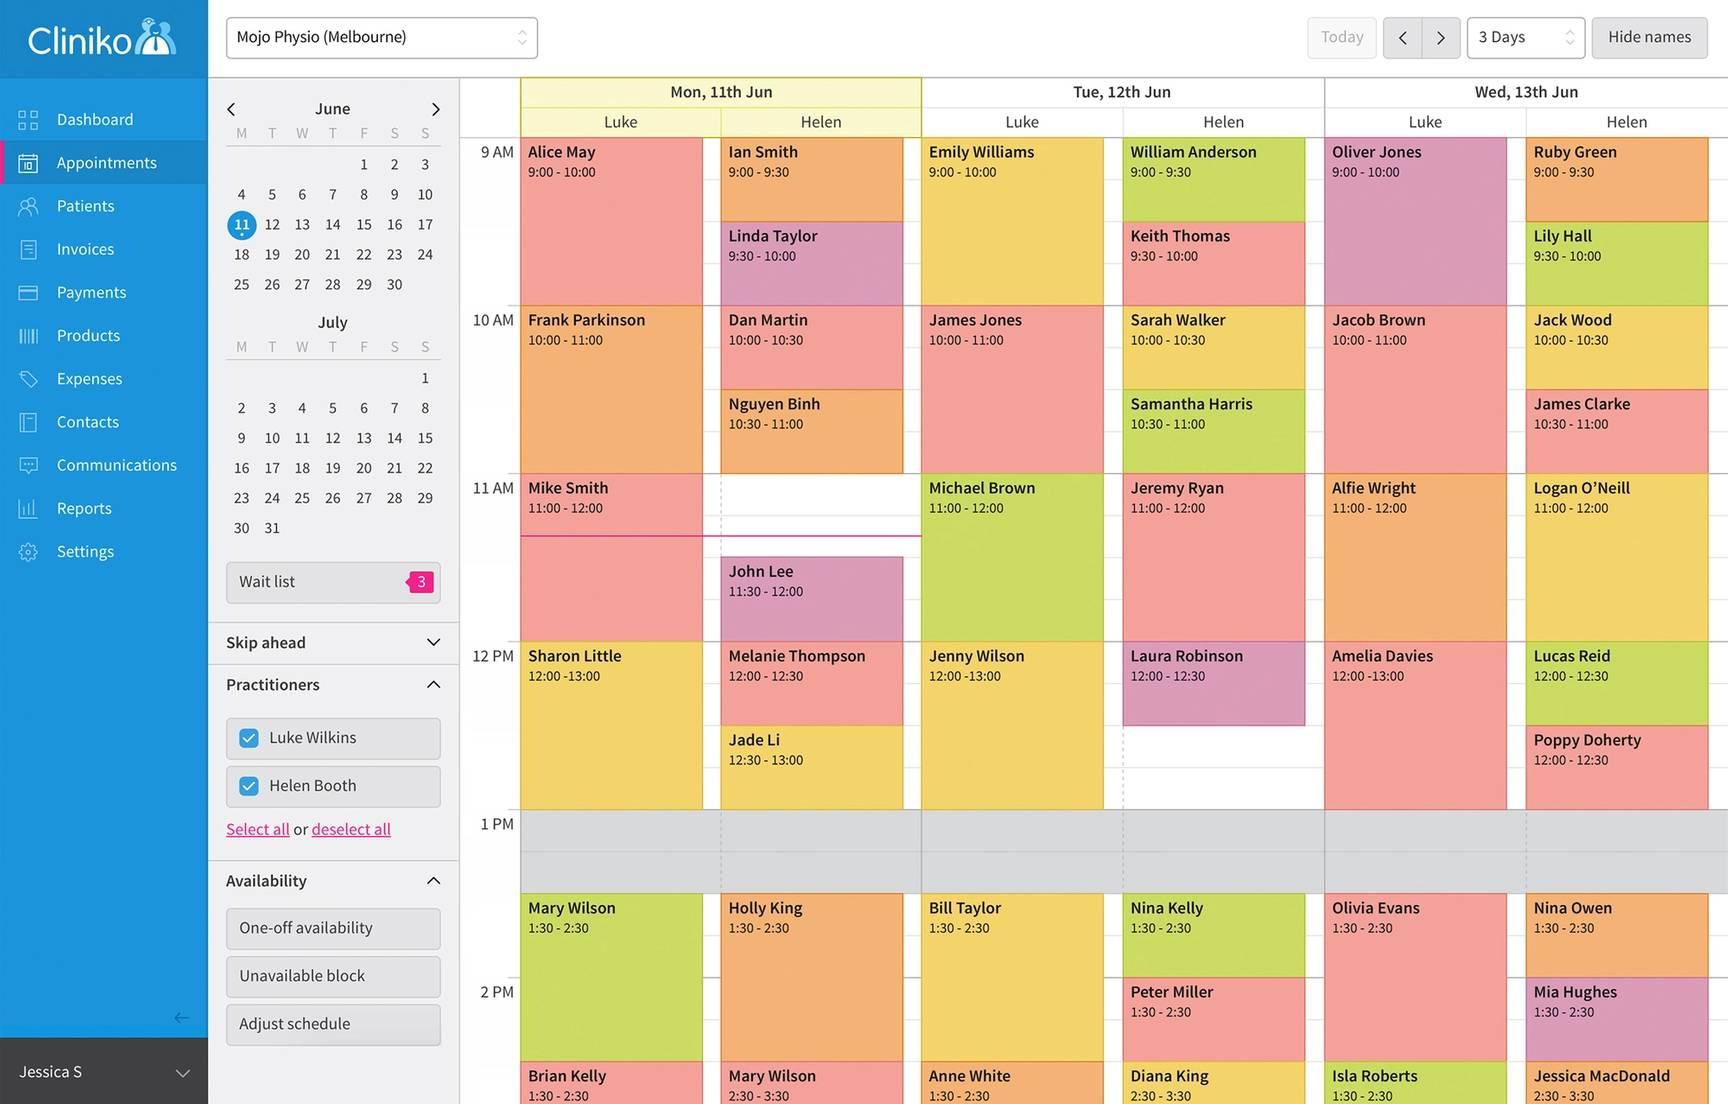 Cliniko calendar view